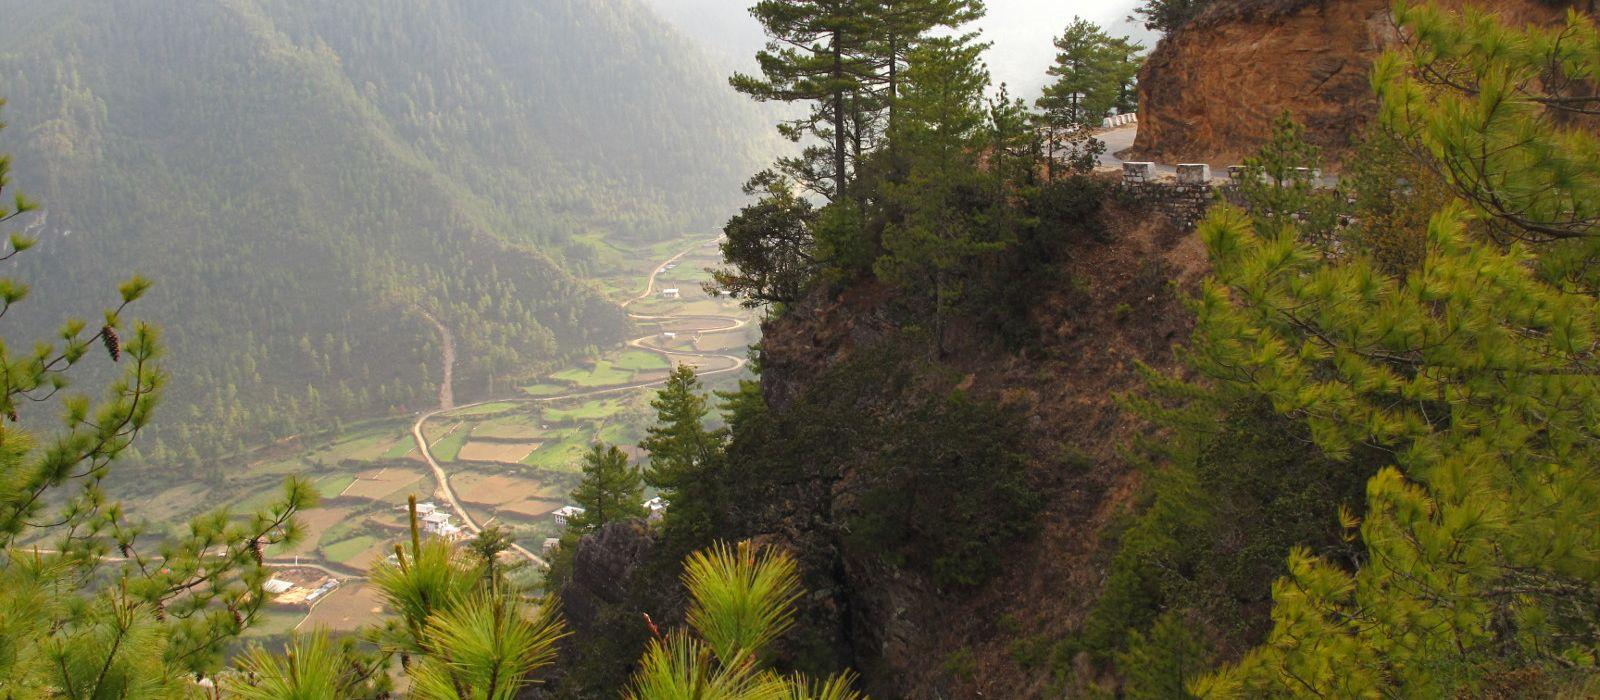 Hotel Trekking in Gangtey Bhutan